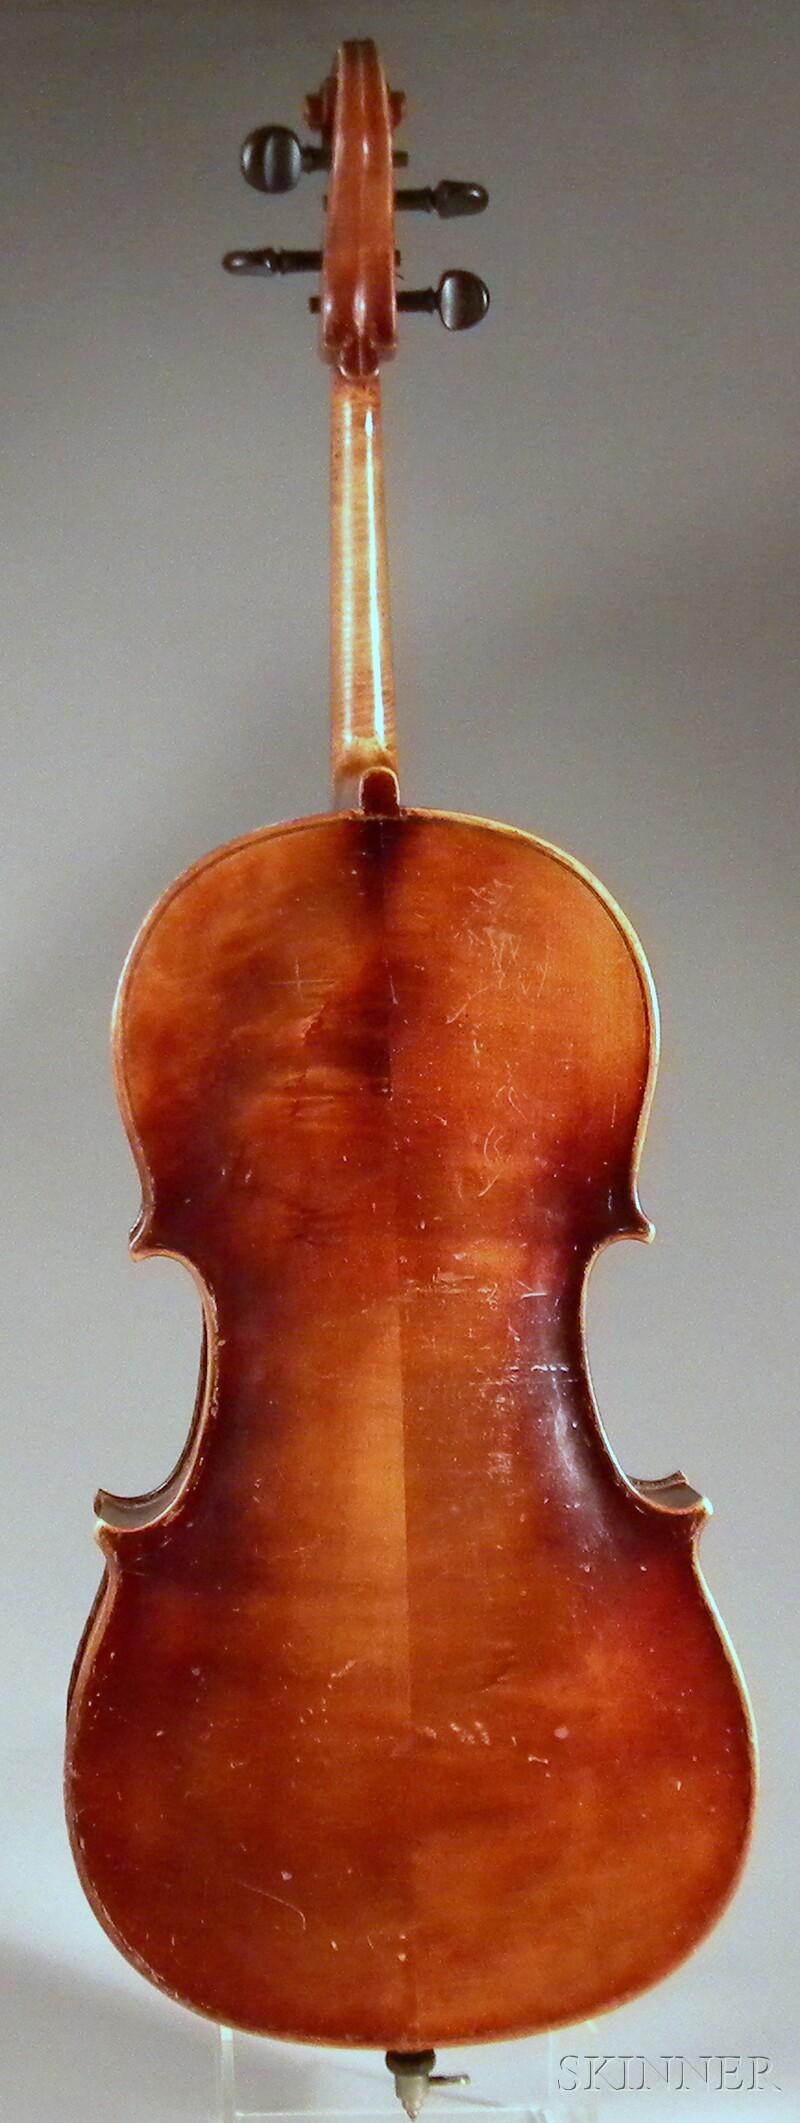 3/4-size German Cello